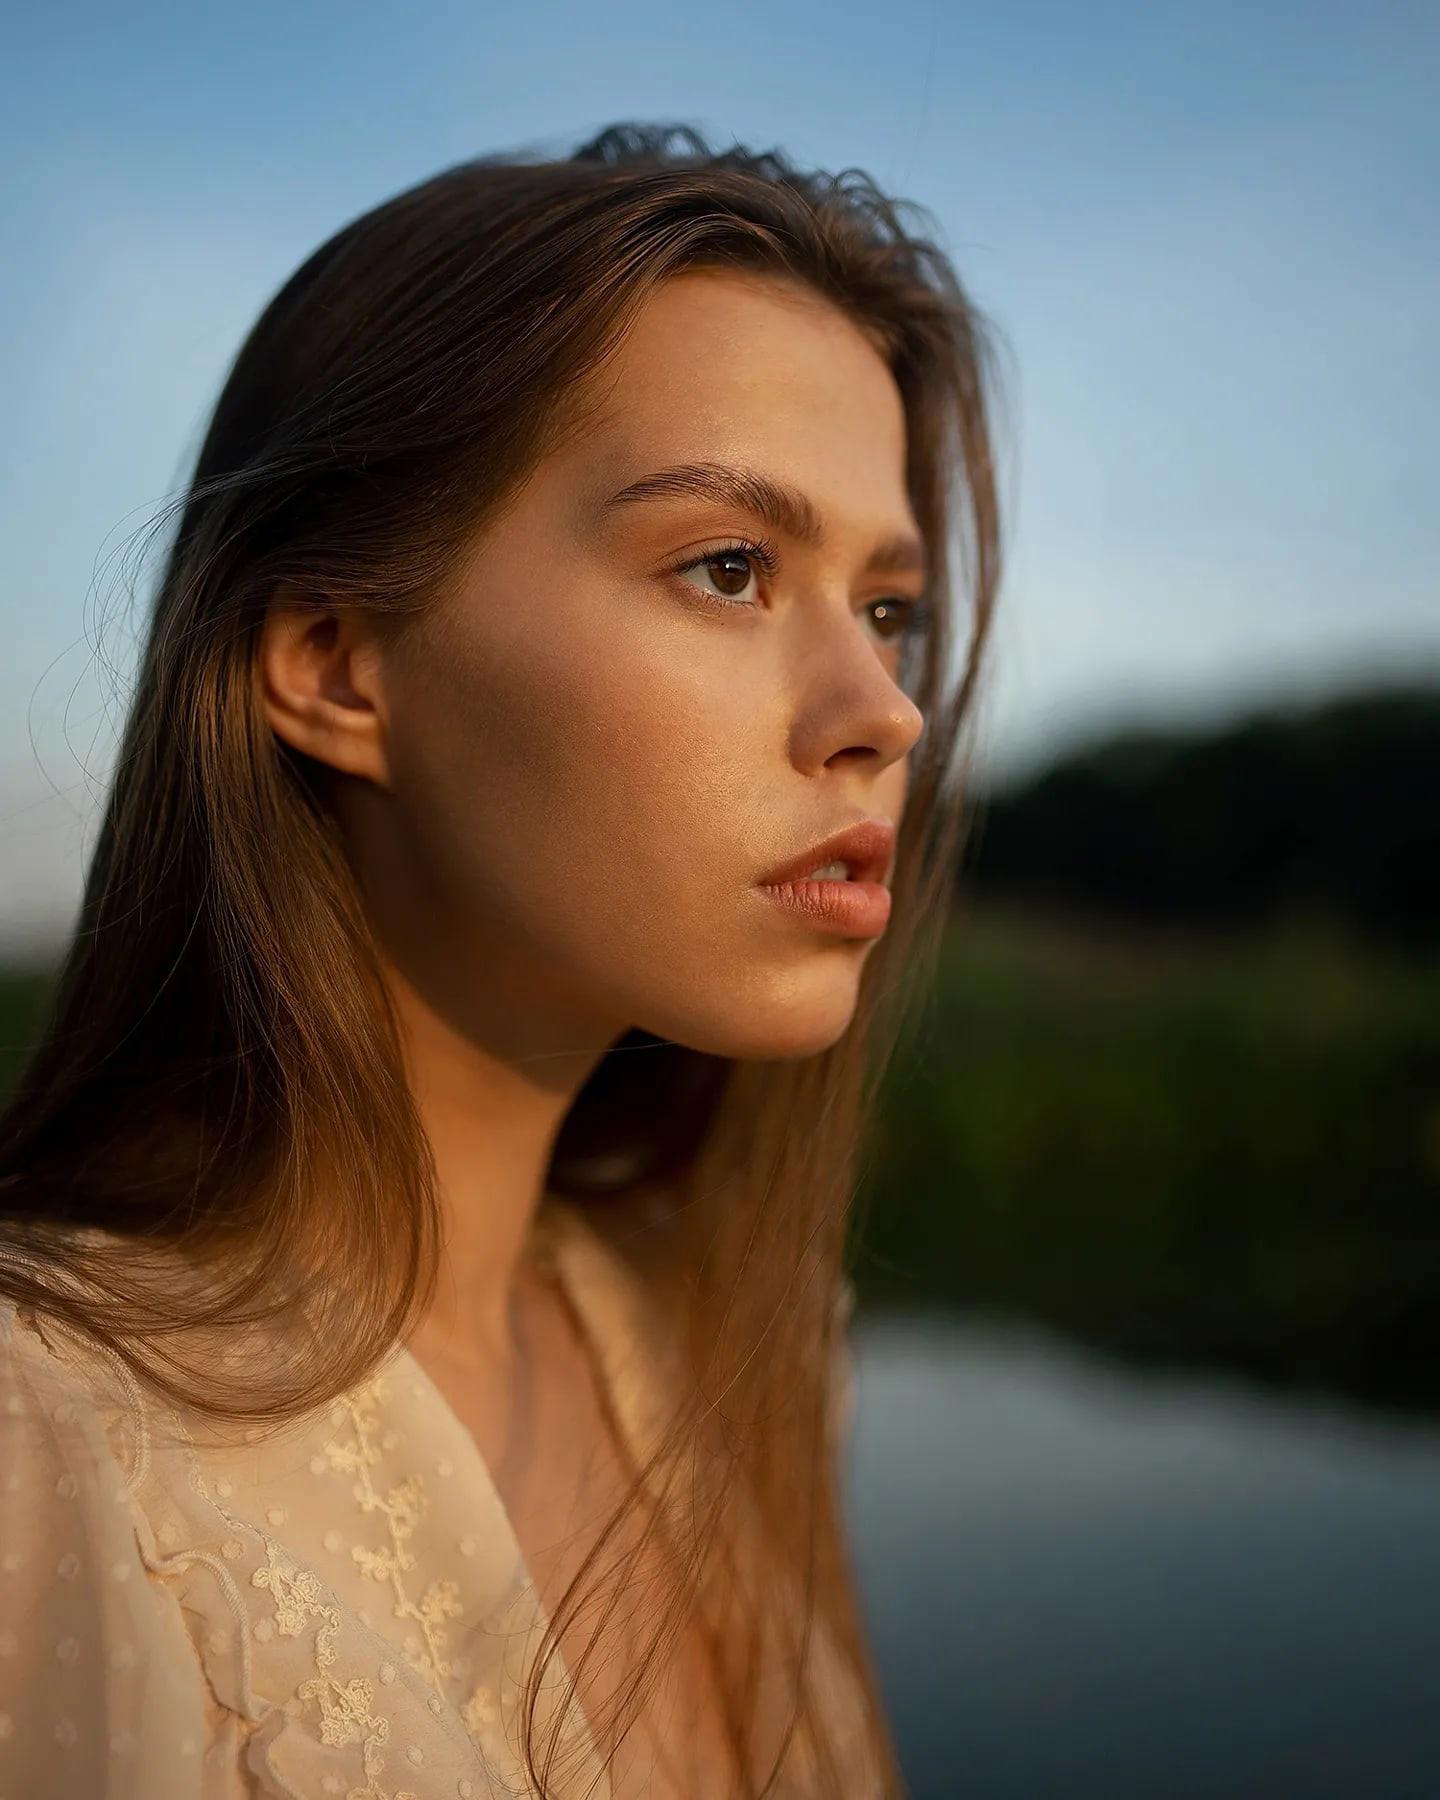 https://www.youngfolks.ru/pub/photographer-kameliya-lapina-112774